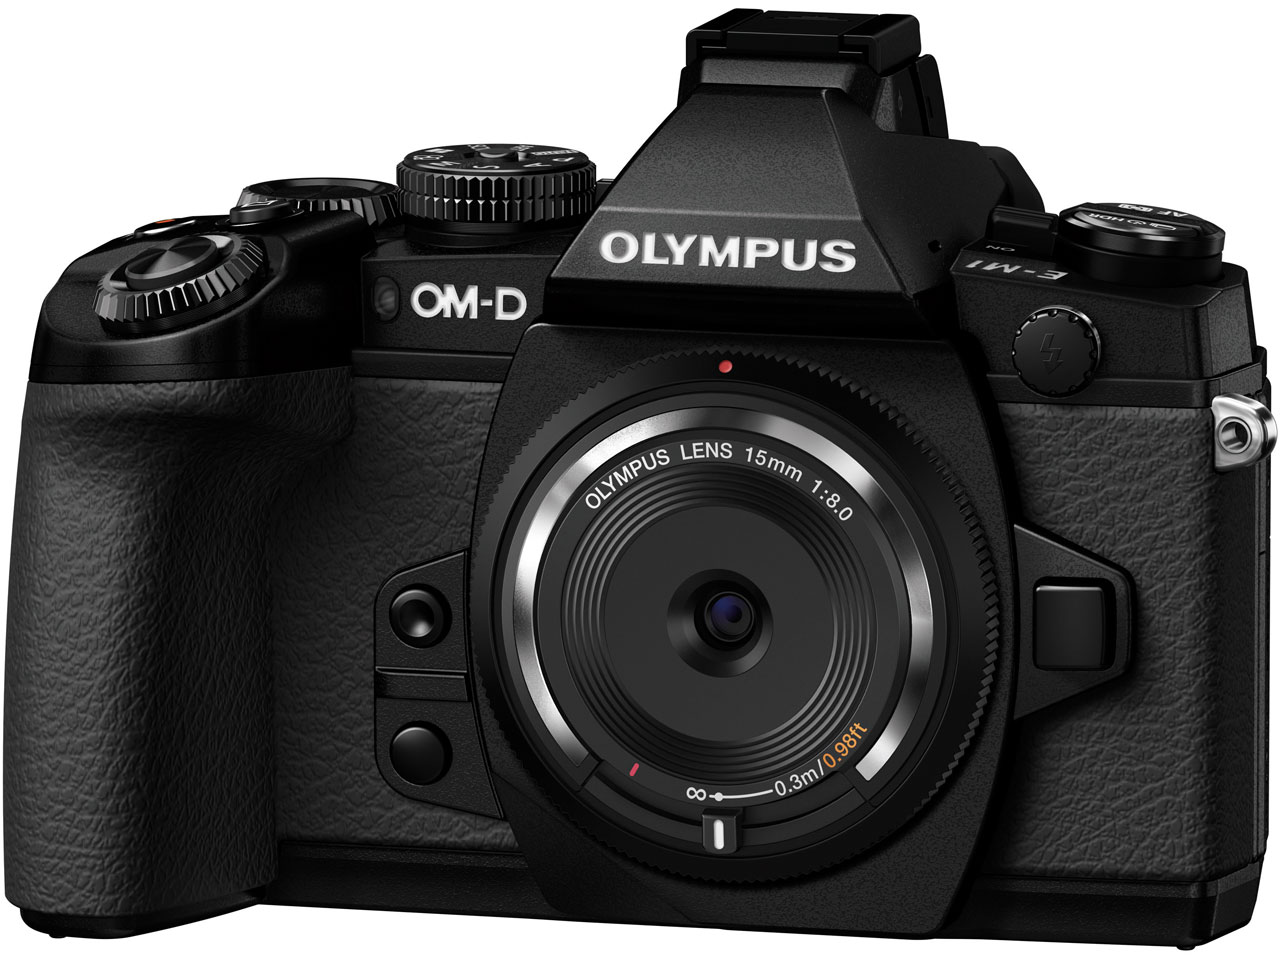 OLYMPUS OM-D E-M1 ボディ [ブラック] の製品画像